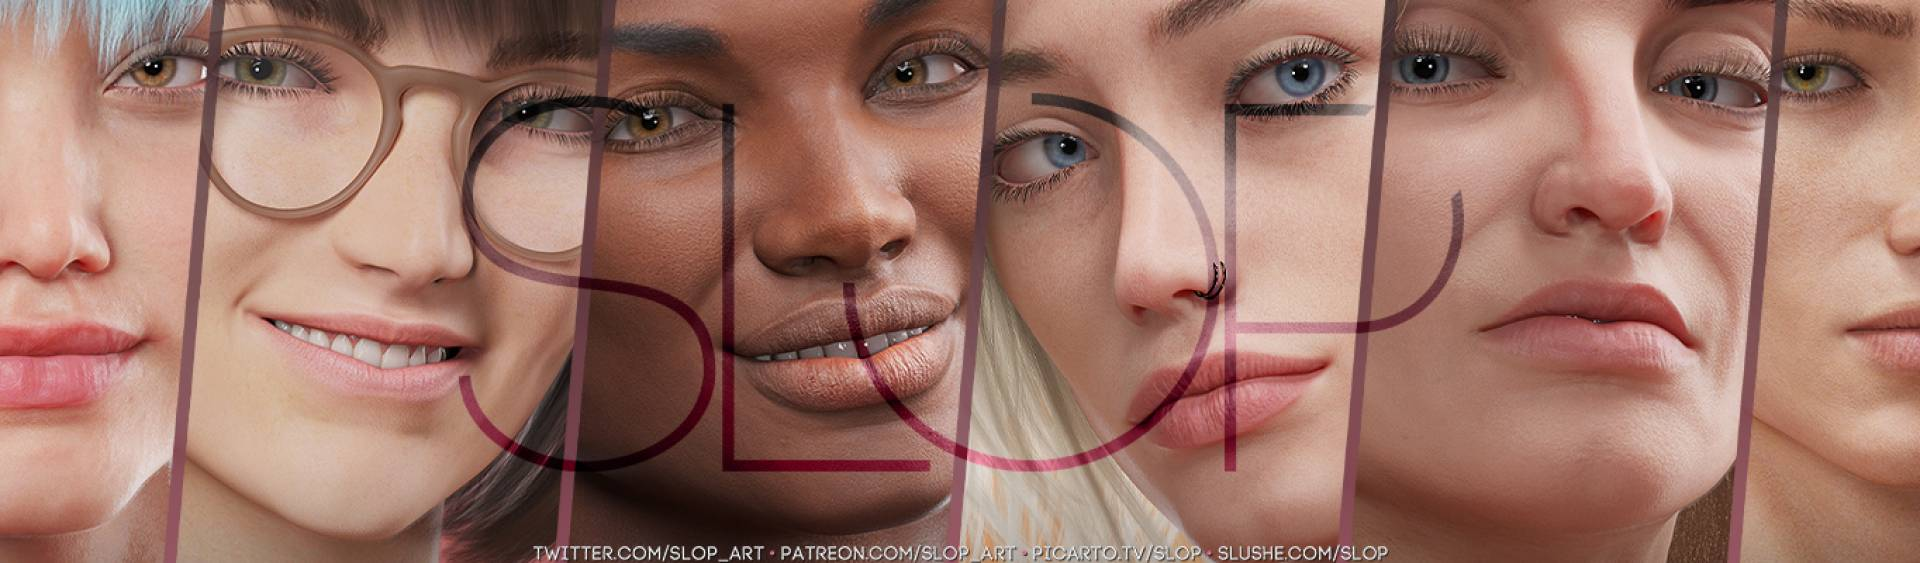 SloP artist cover image